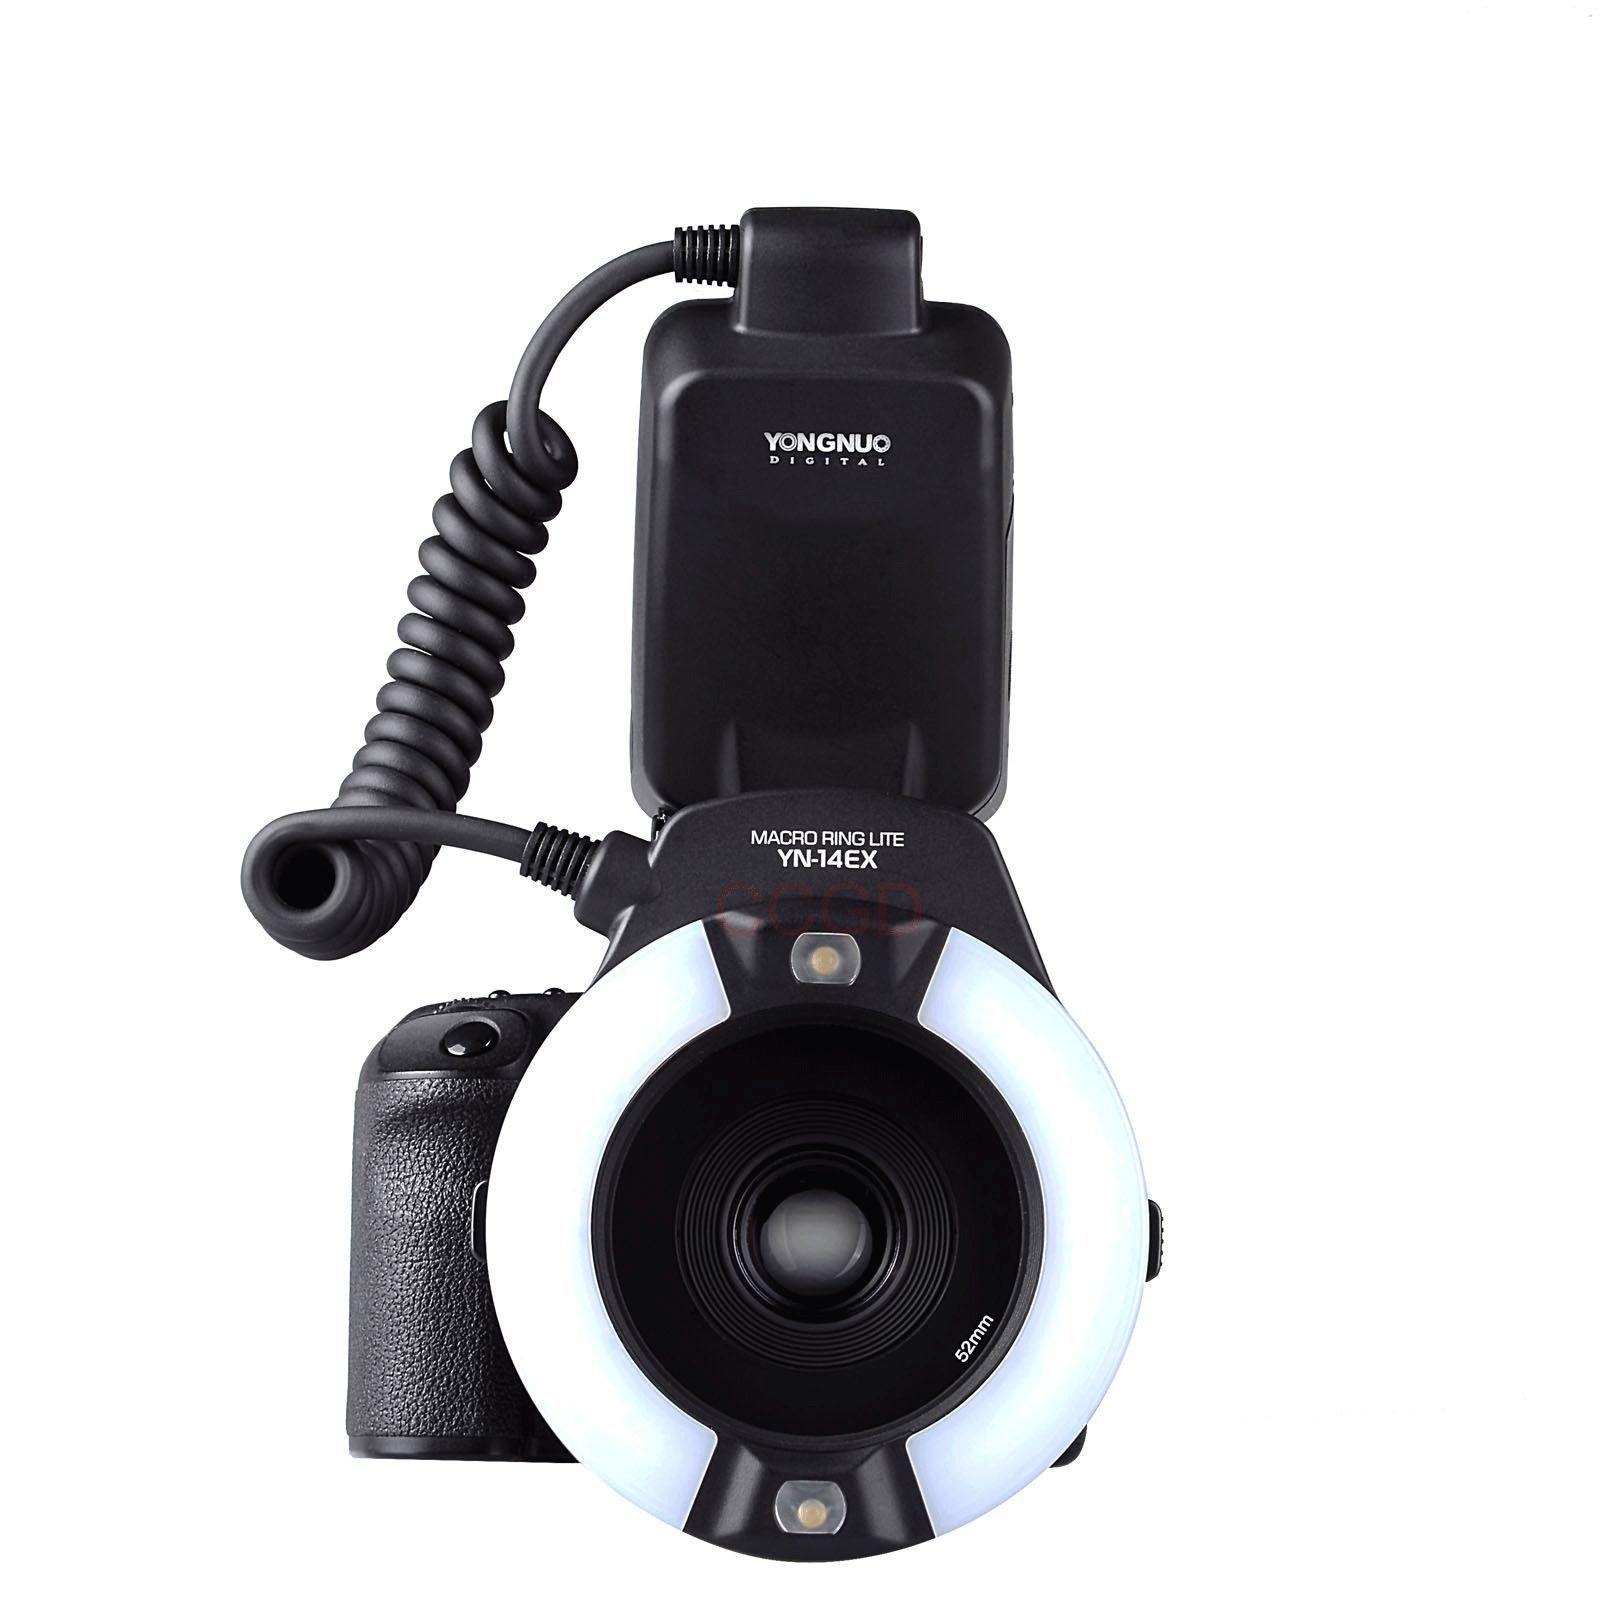 Iluminador de LED Profissional Yongnuo YN14EX